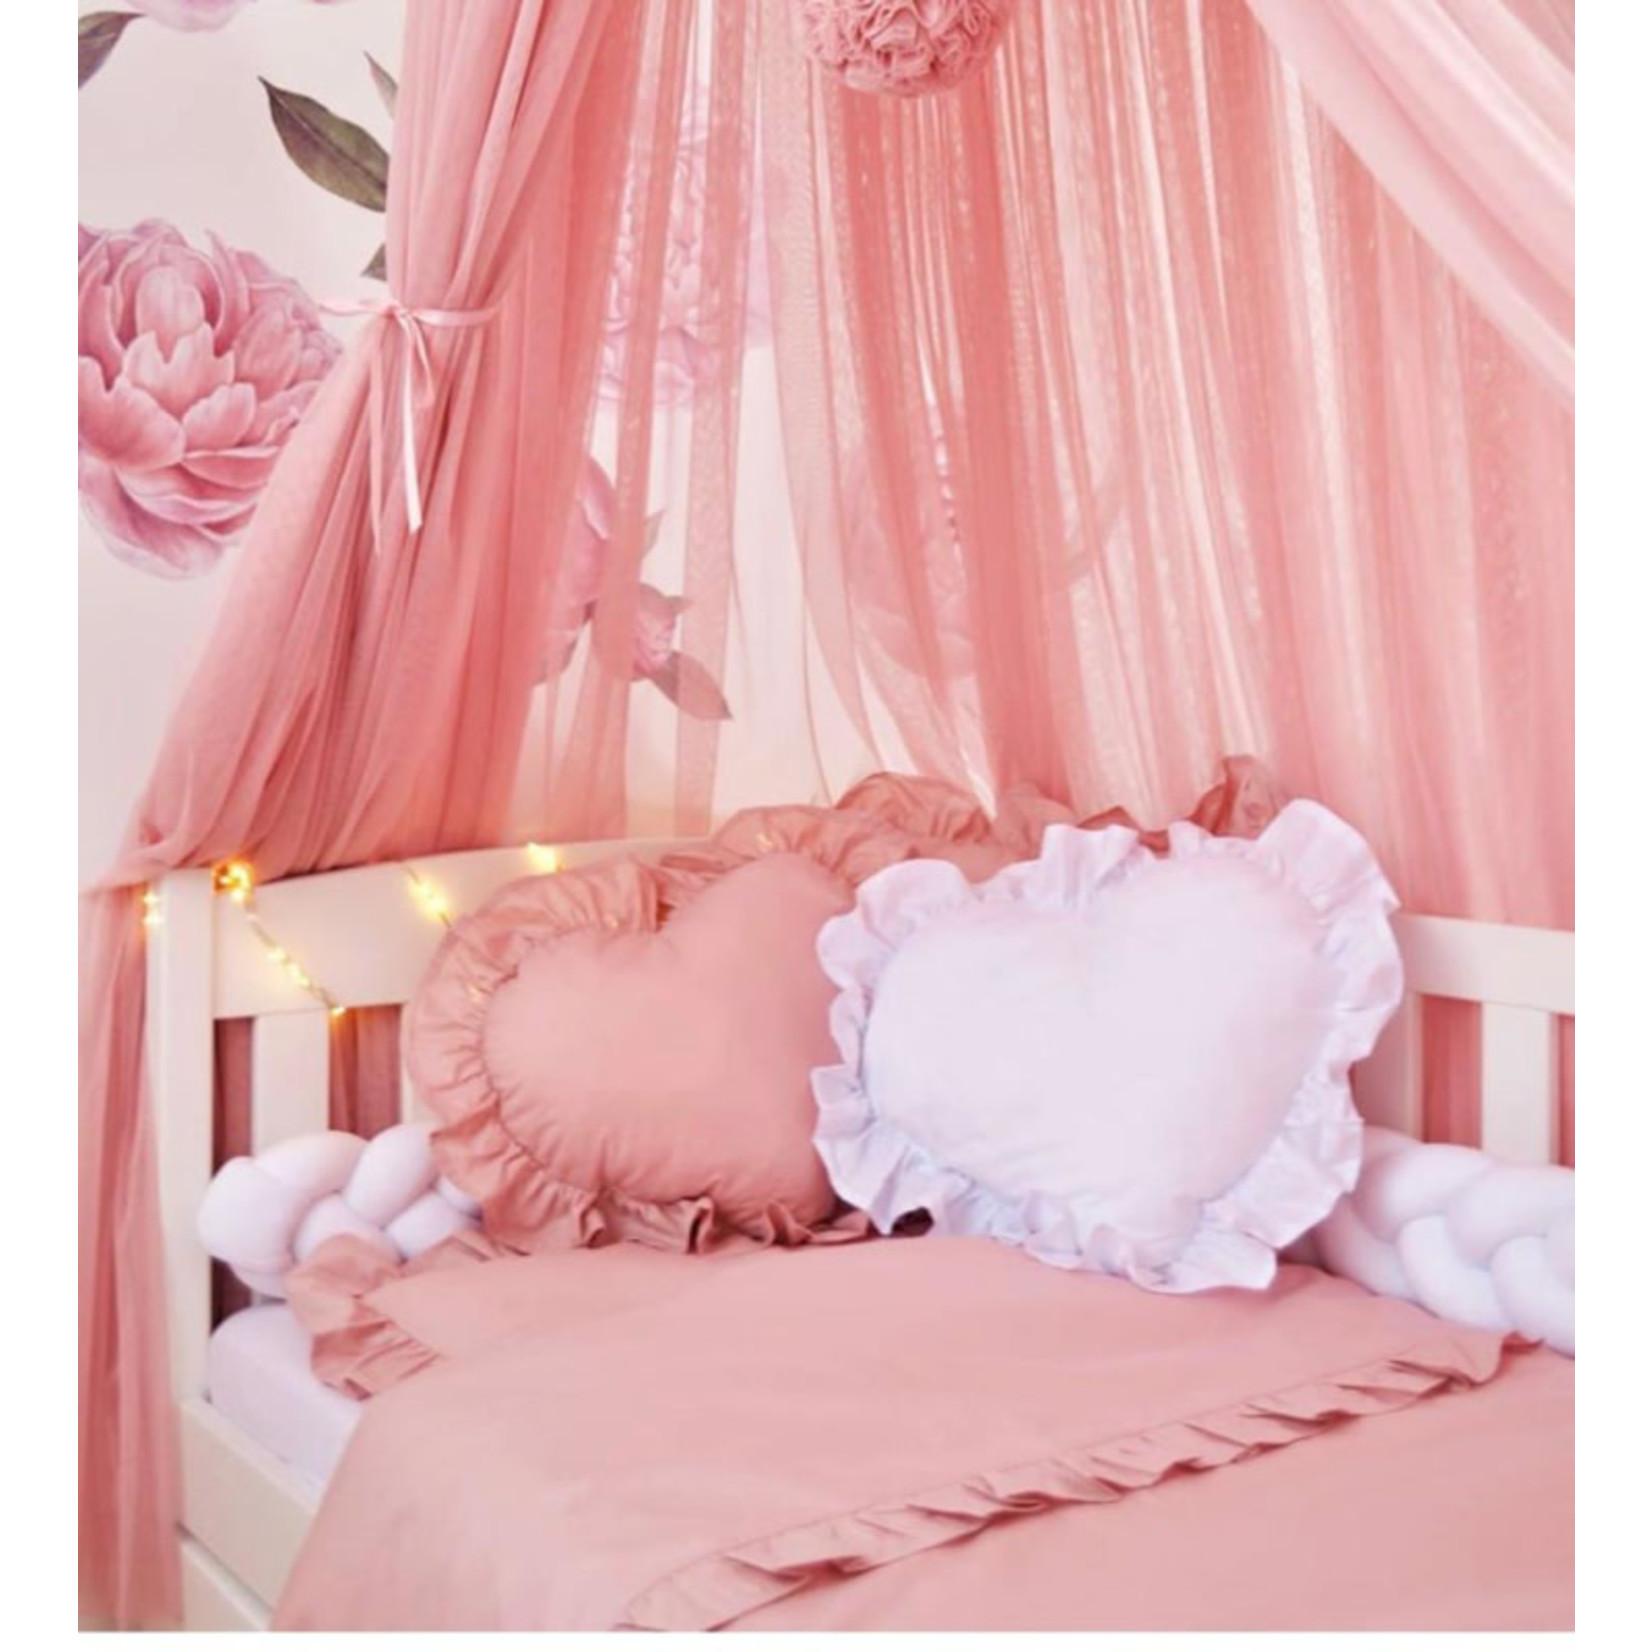 Pillow Heart White